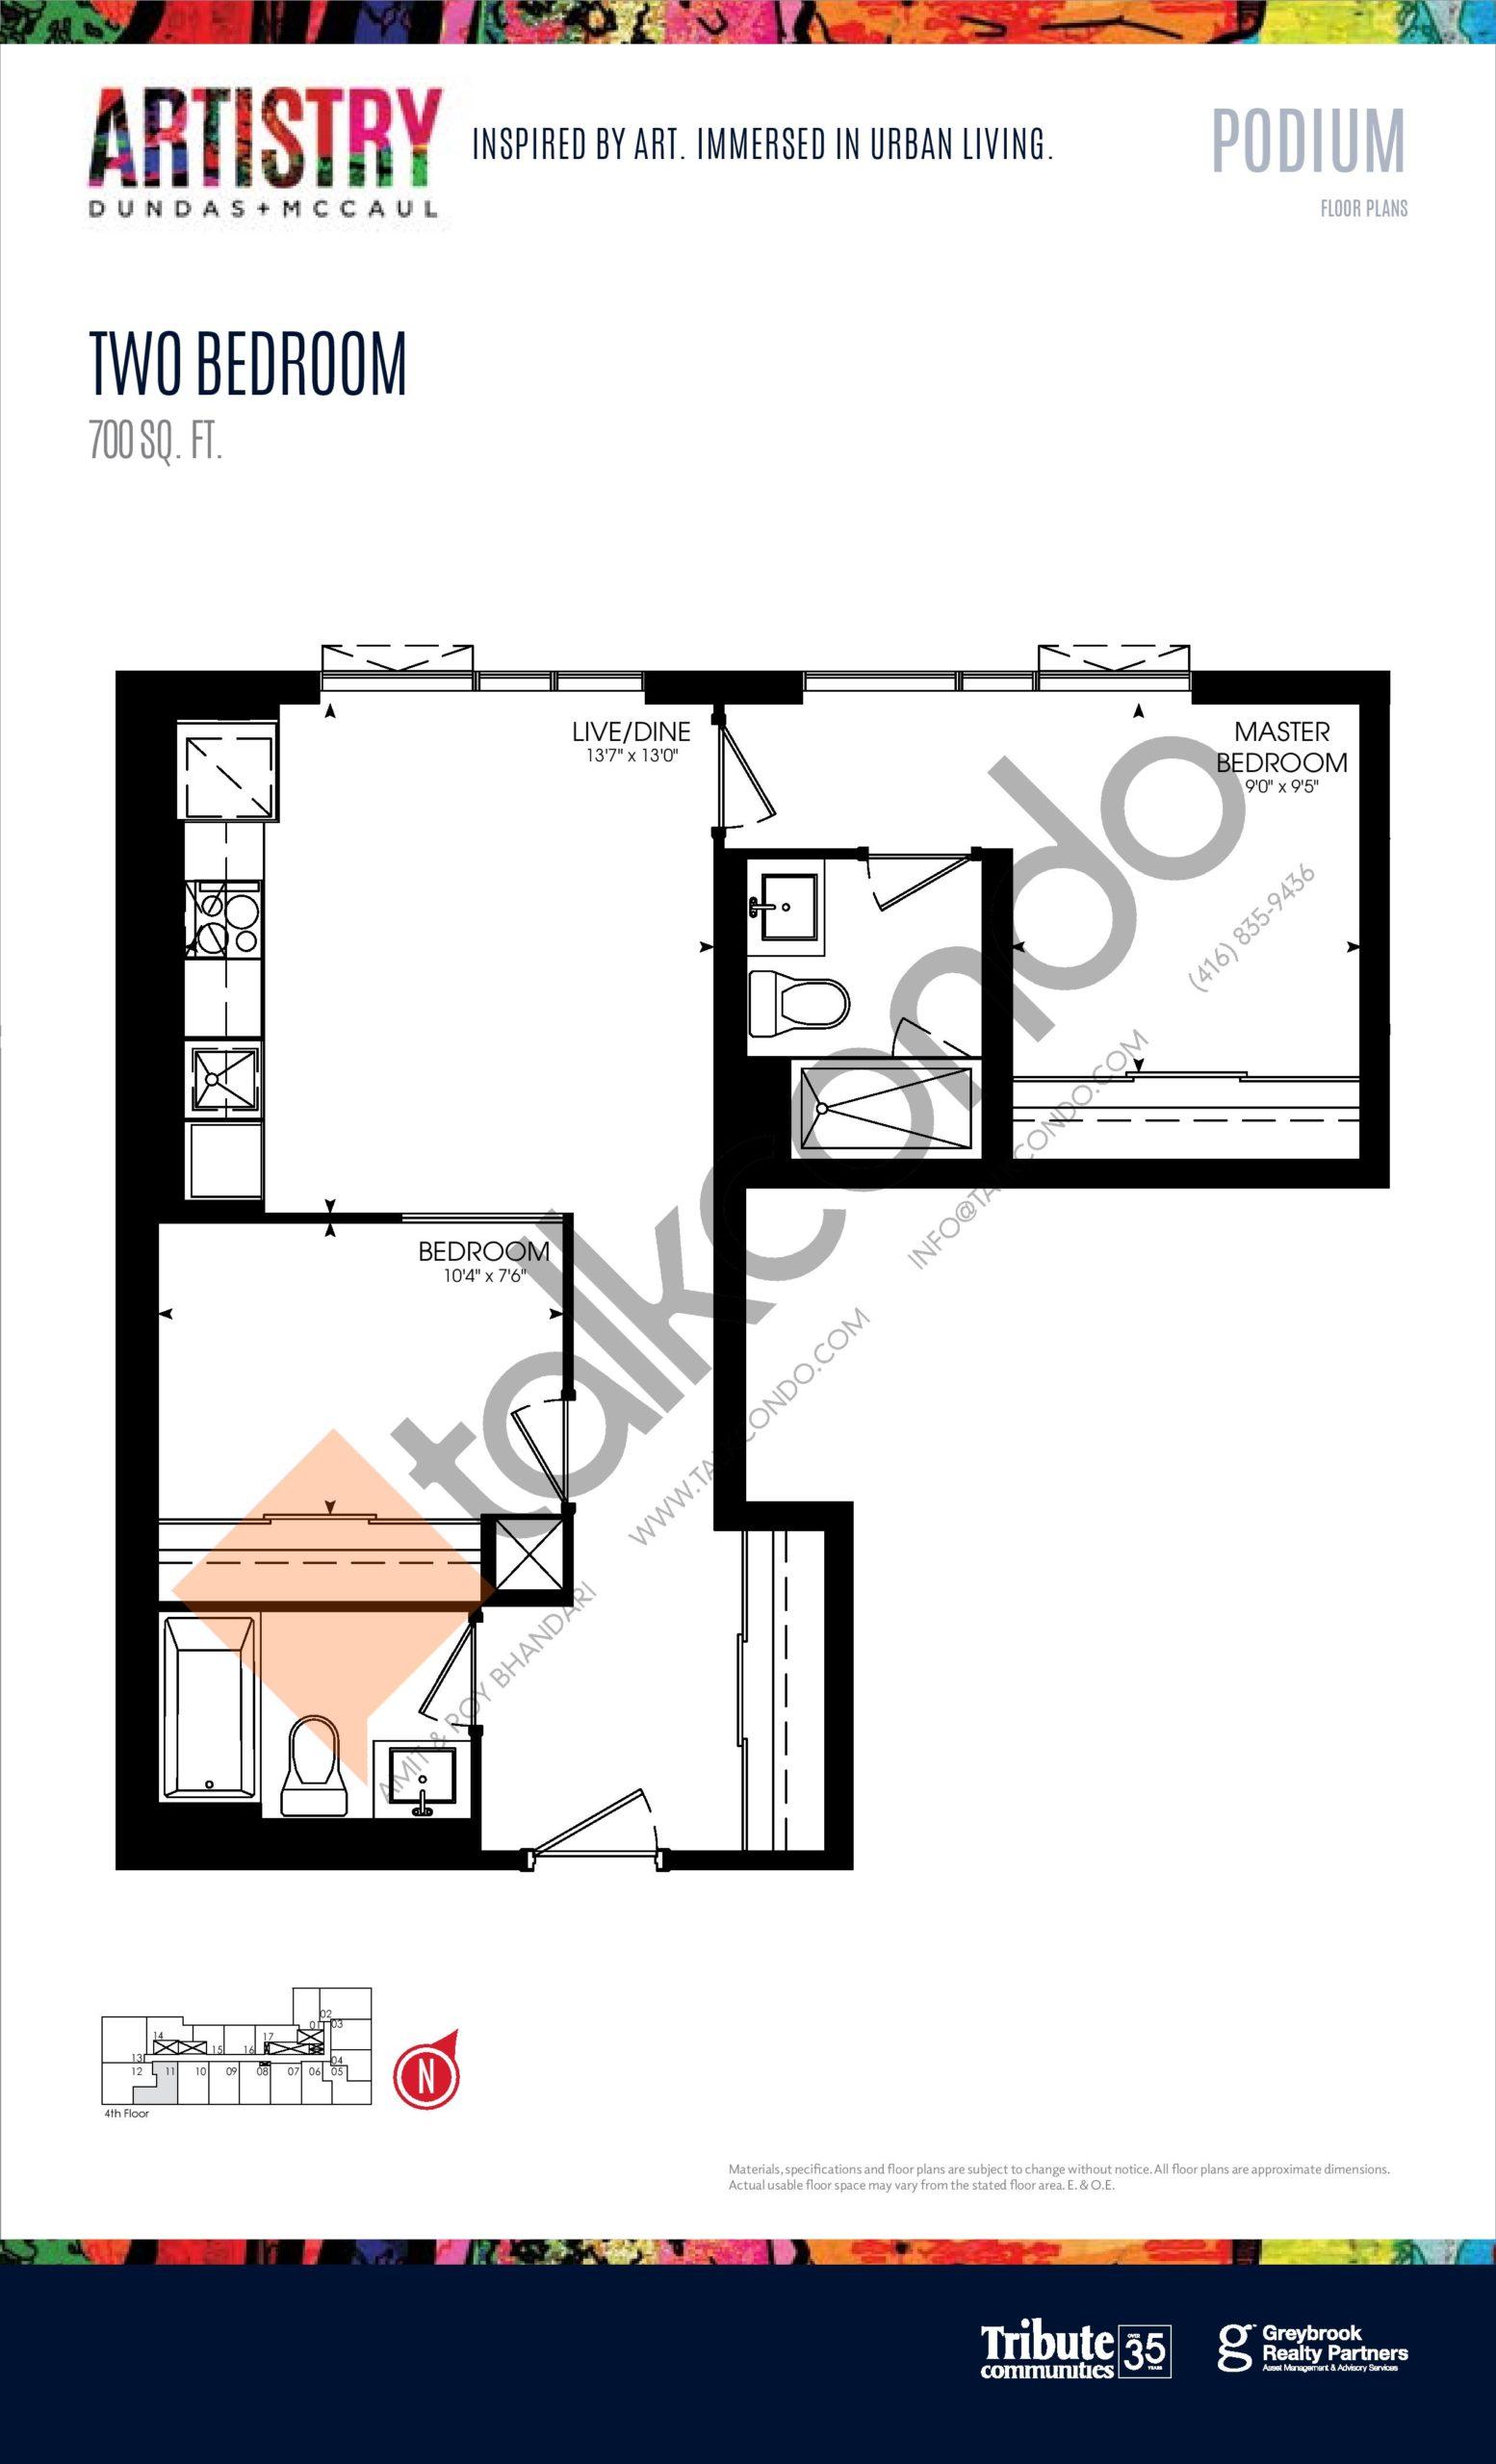 700 sq. ft. - Podium Floor Plan at Artistry Condos - 700 sq.ft